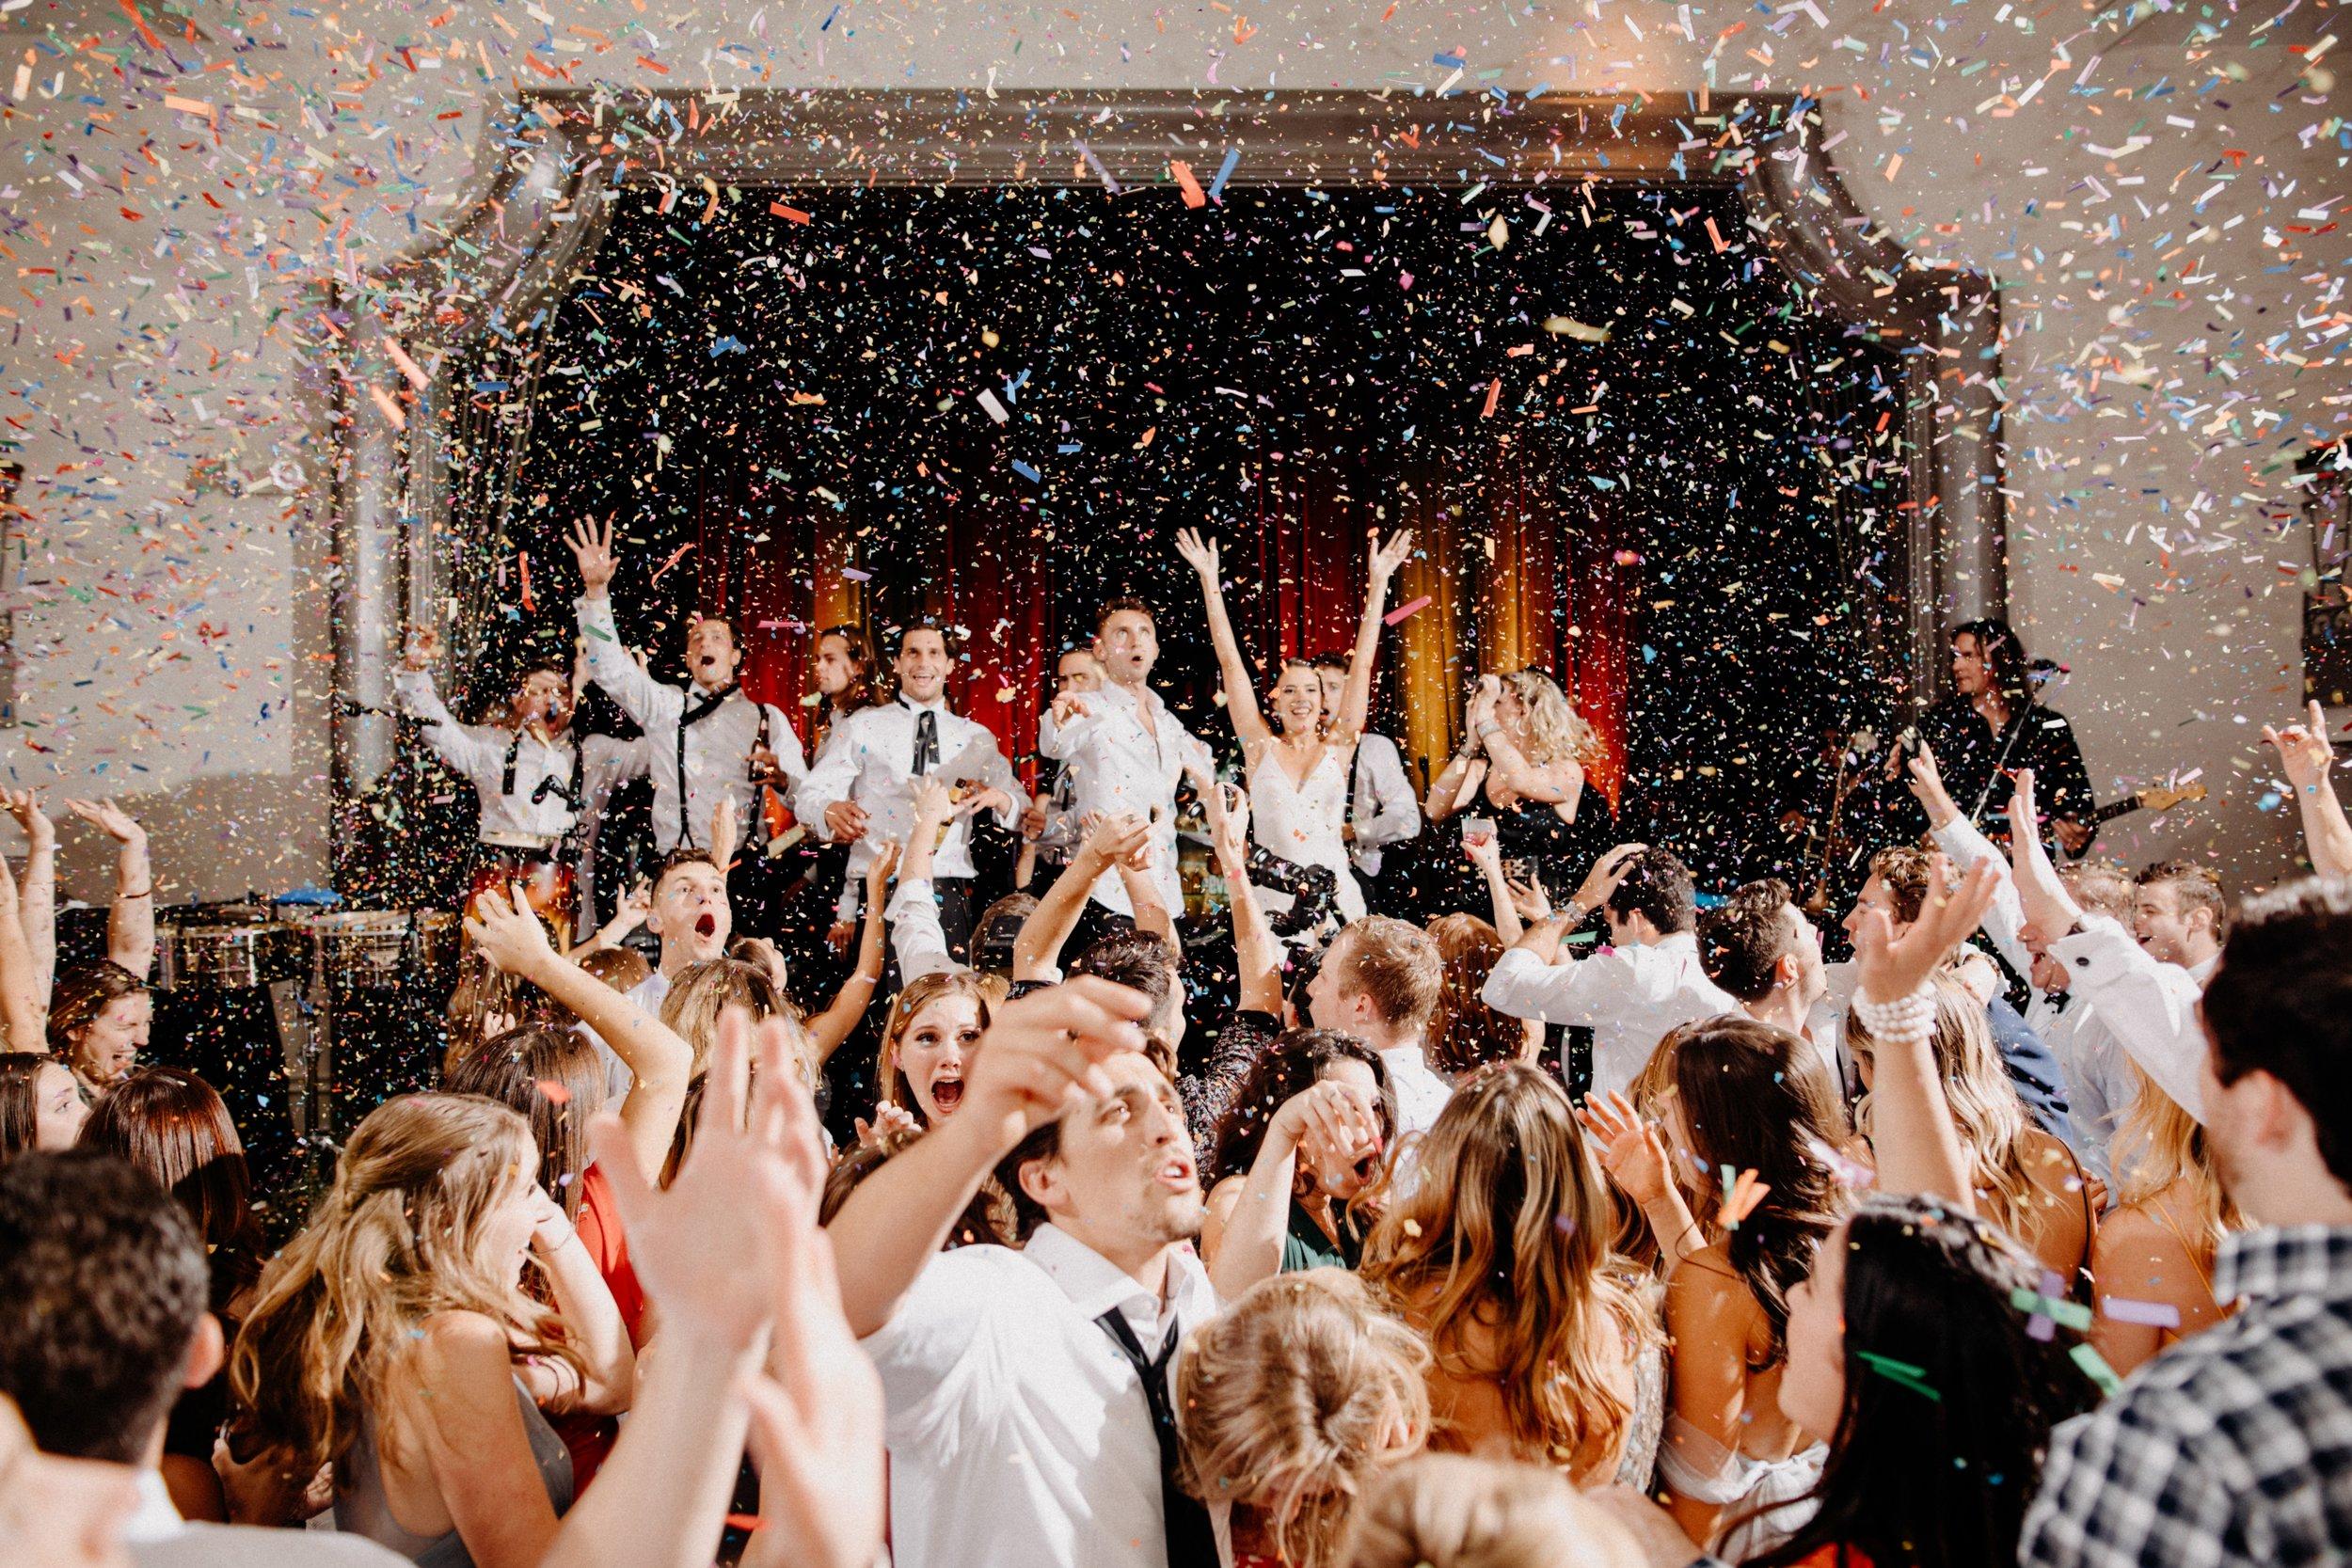 st-anthony-hotel-wedding-photography-10209san-antonio.JPG